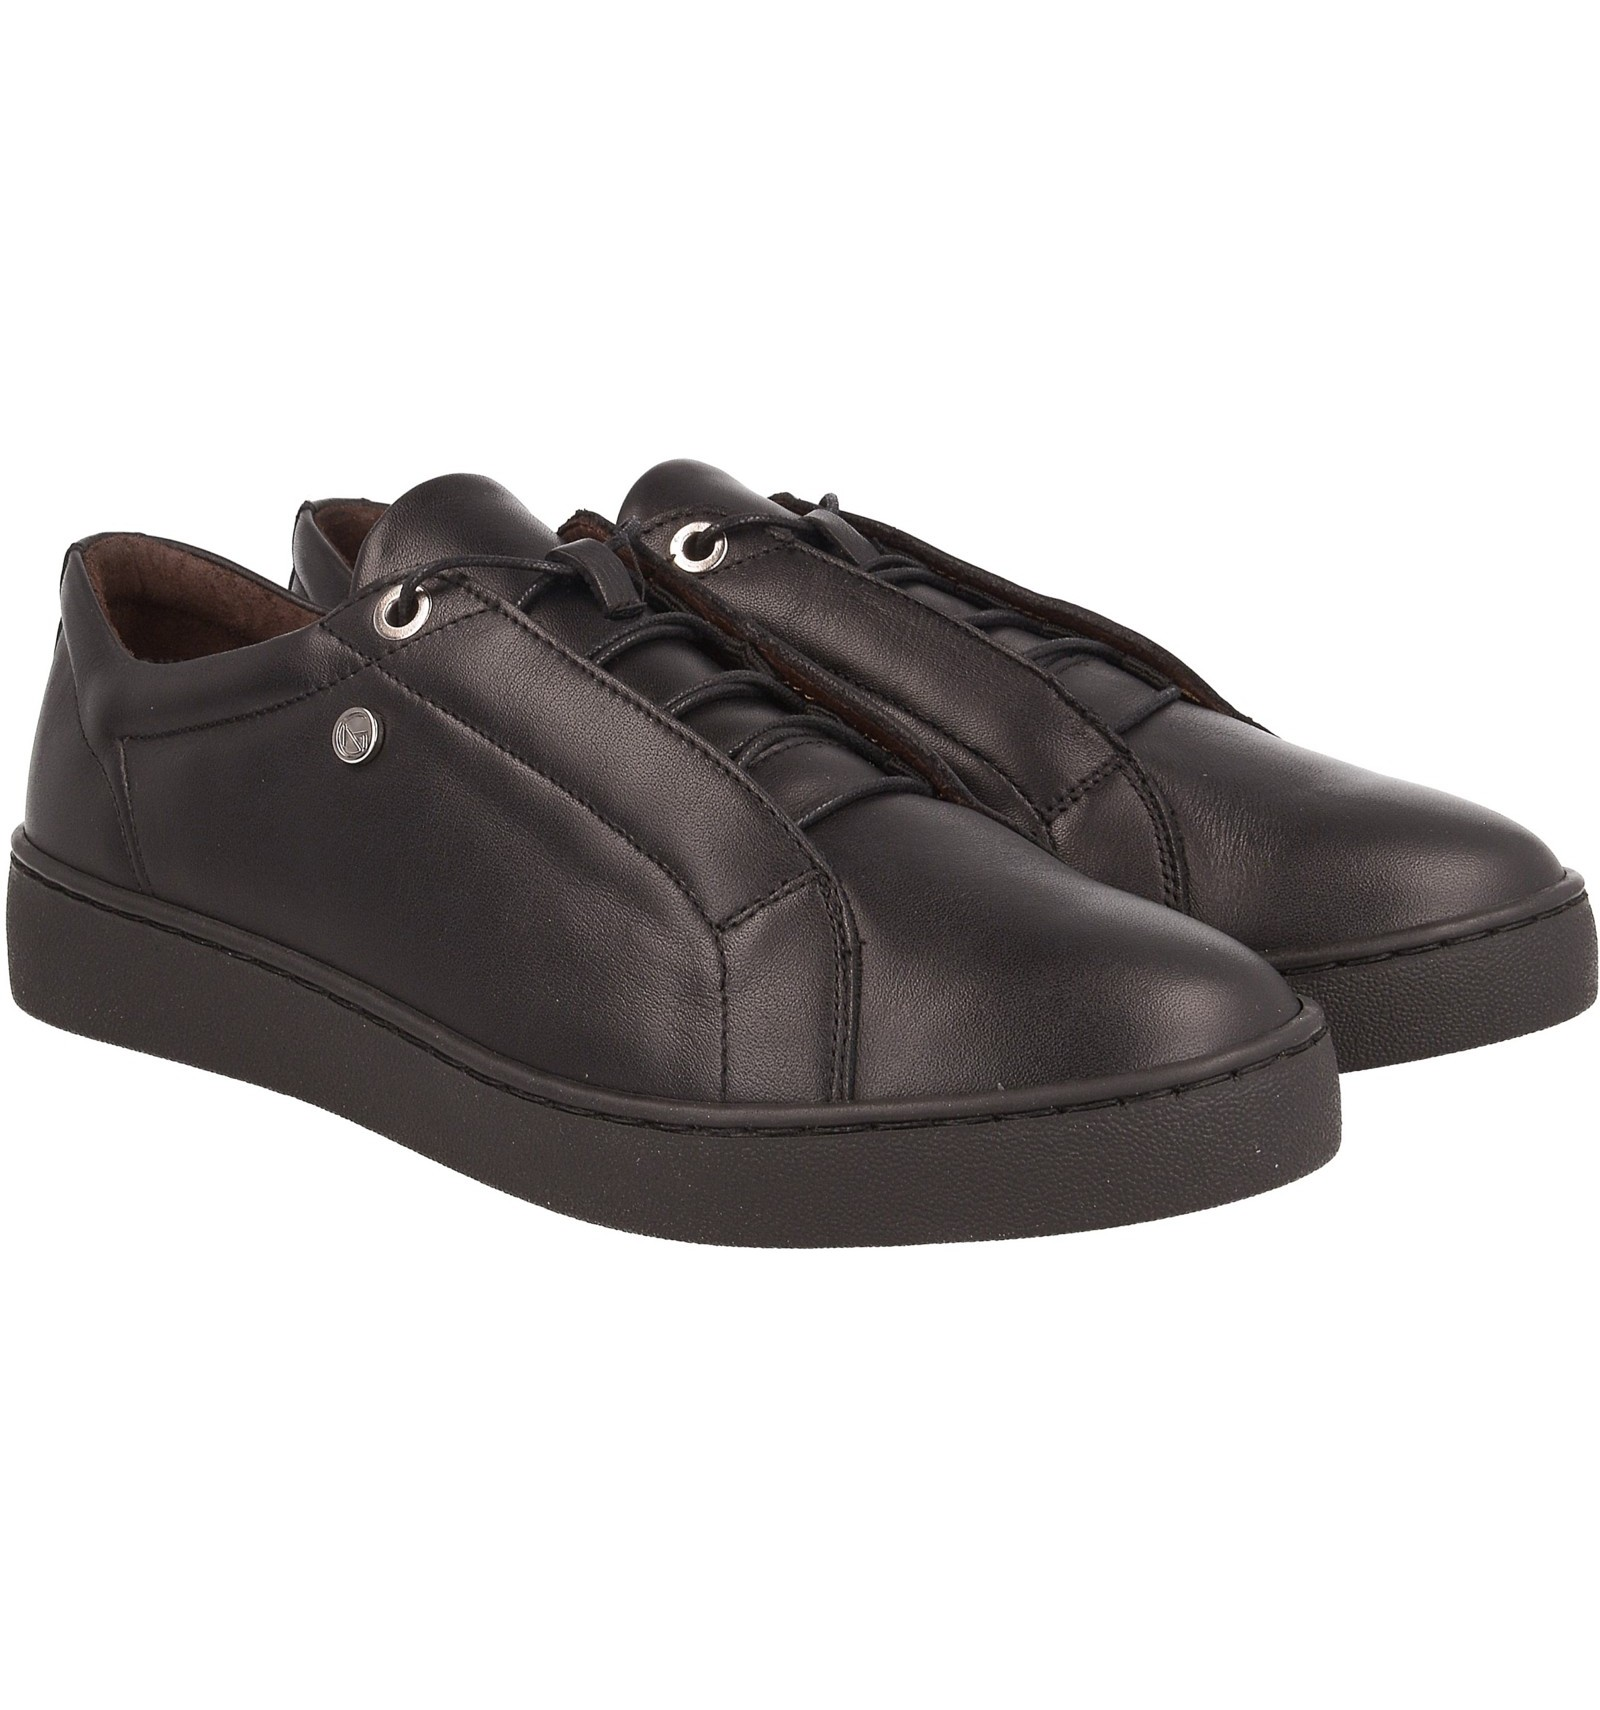 Sneakersy damskie, CZARNE, skóra naturalna, klasyczne